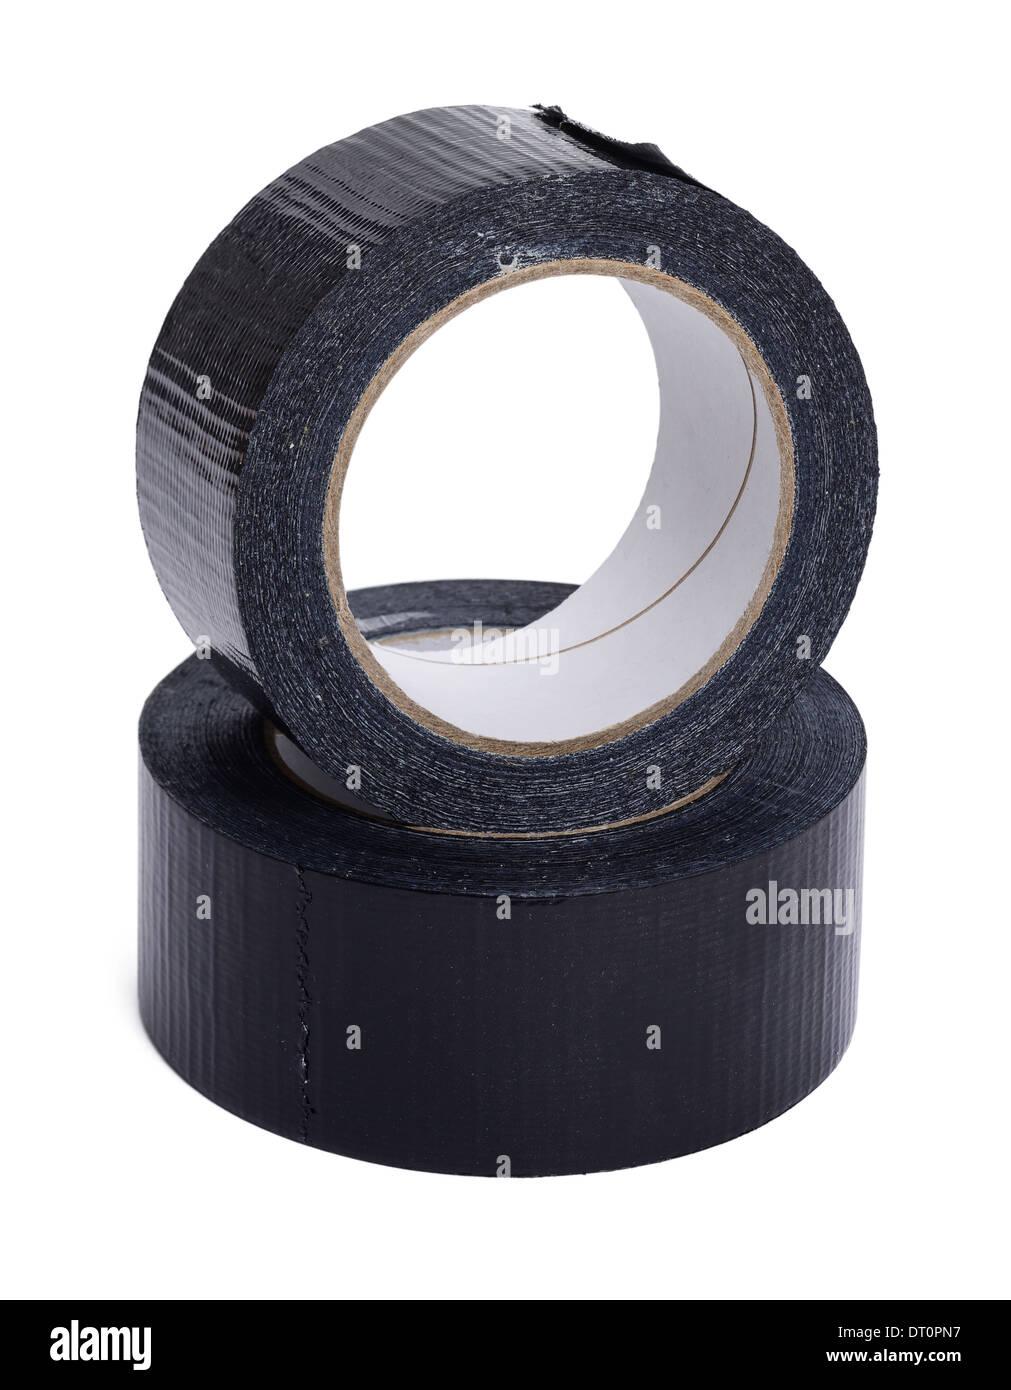 Two rolls of black gaffer tape - Stock Image